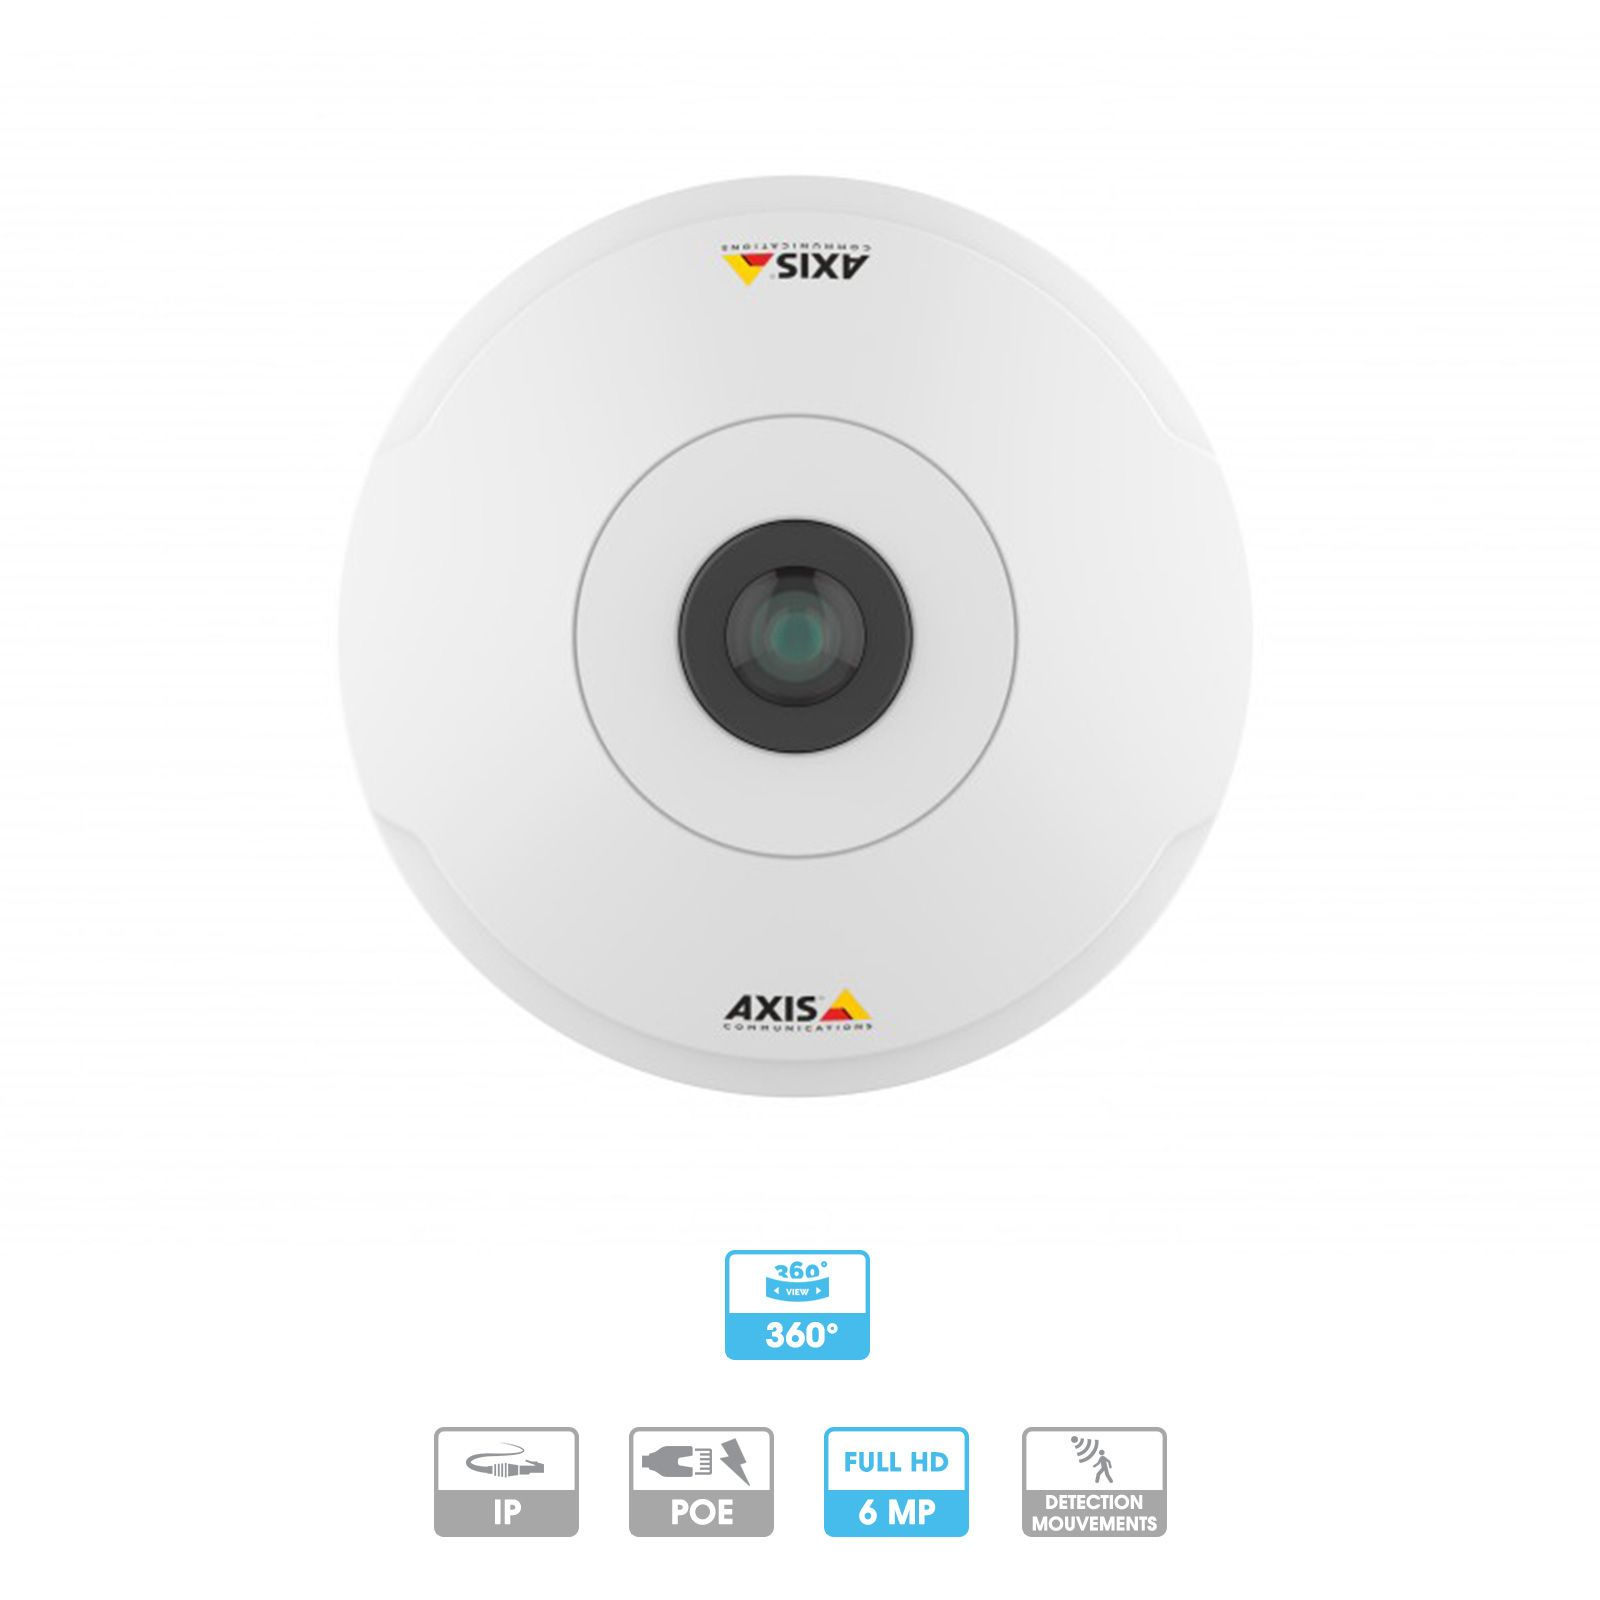 Caméra Axis Companion | 360° fisheye| 6 MP